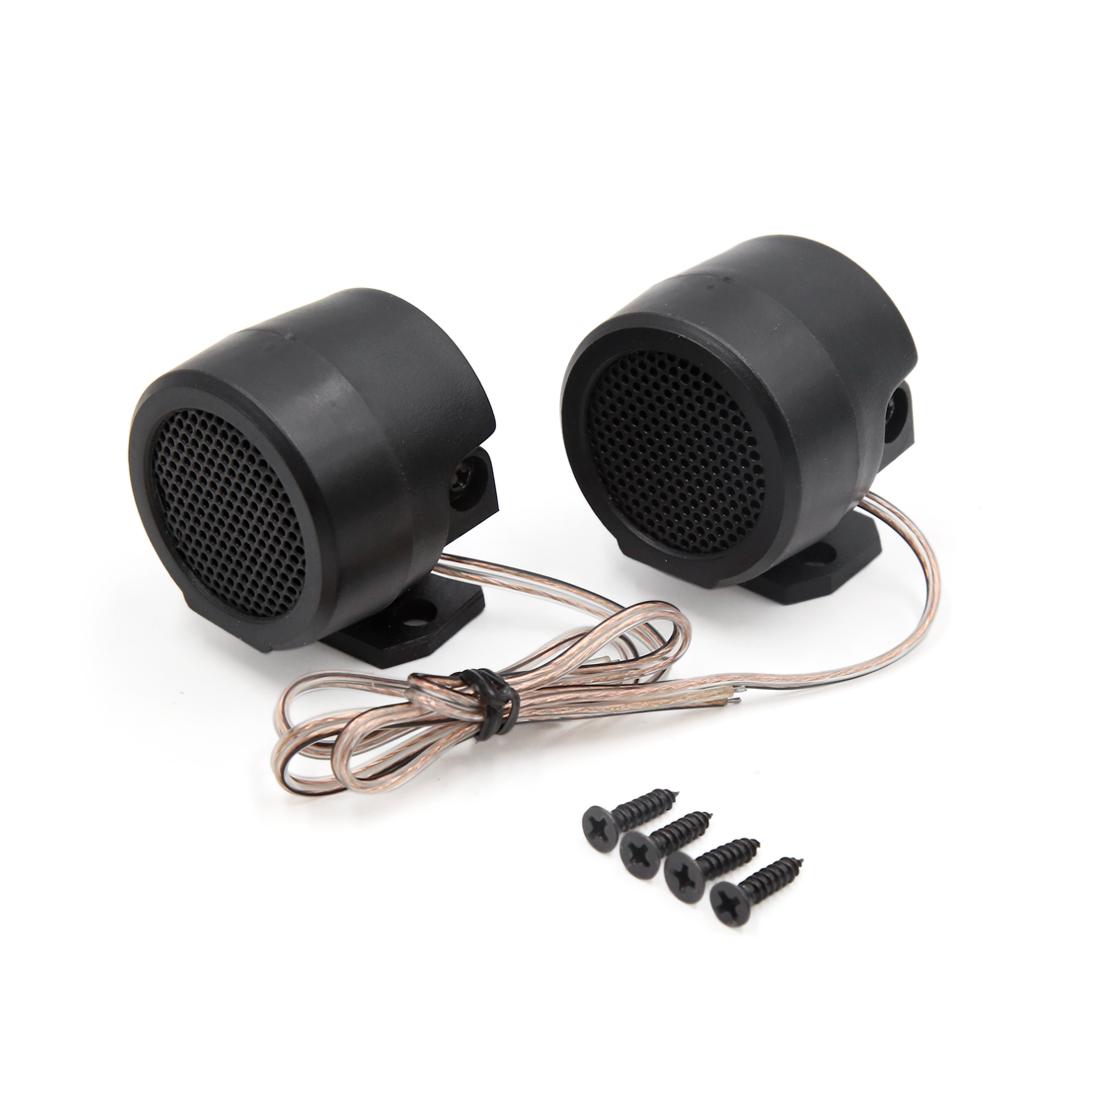 Pair 500W 105dB Auto Car Audio System Loud Speaker Stereo Dome Tweeter Black